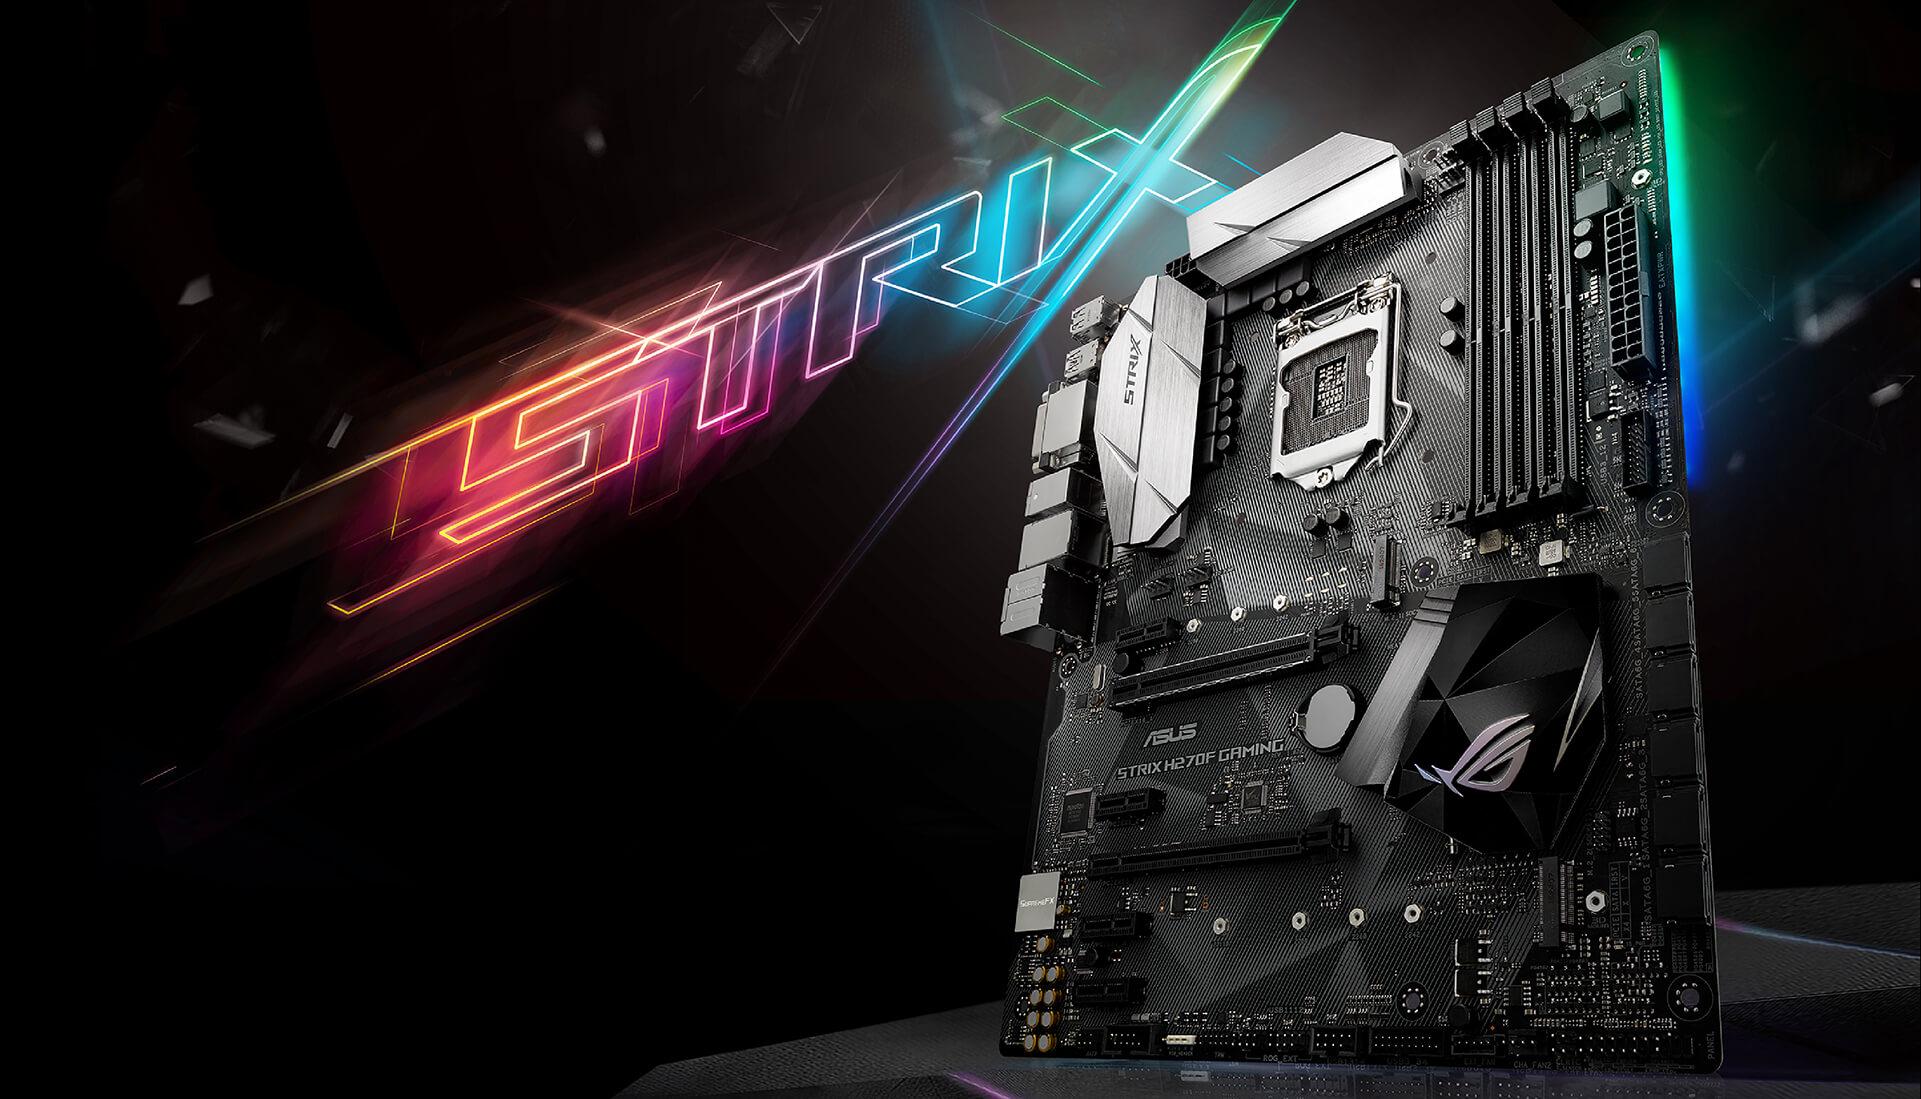 Asus Strix H270F Gaming Intel,1151 Strix H270F Gaming, Intel, 90MB0S70-M0EAY0 , Intel Celeron, Intel Pentium, DDR4-SDRAM, DIMM, Strix H270F Gaming, Intel, LGA 1151 Socket H4